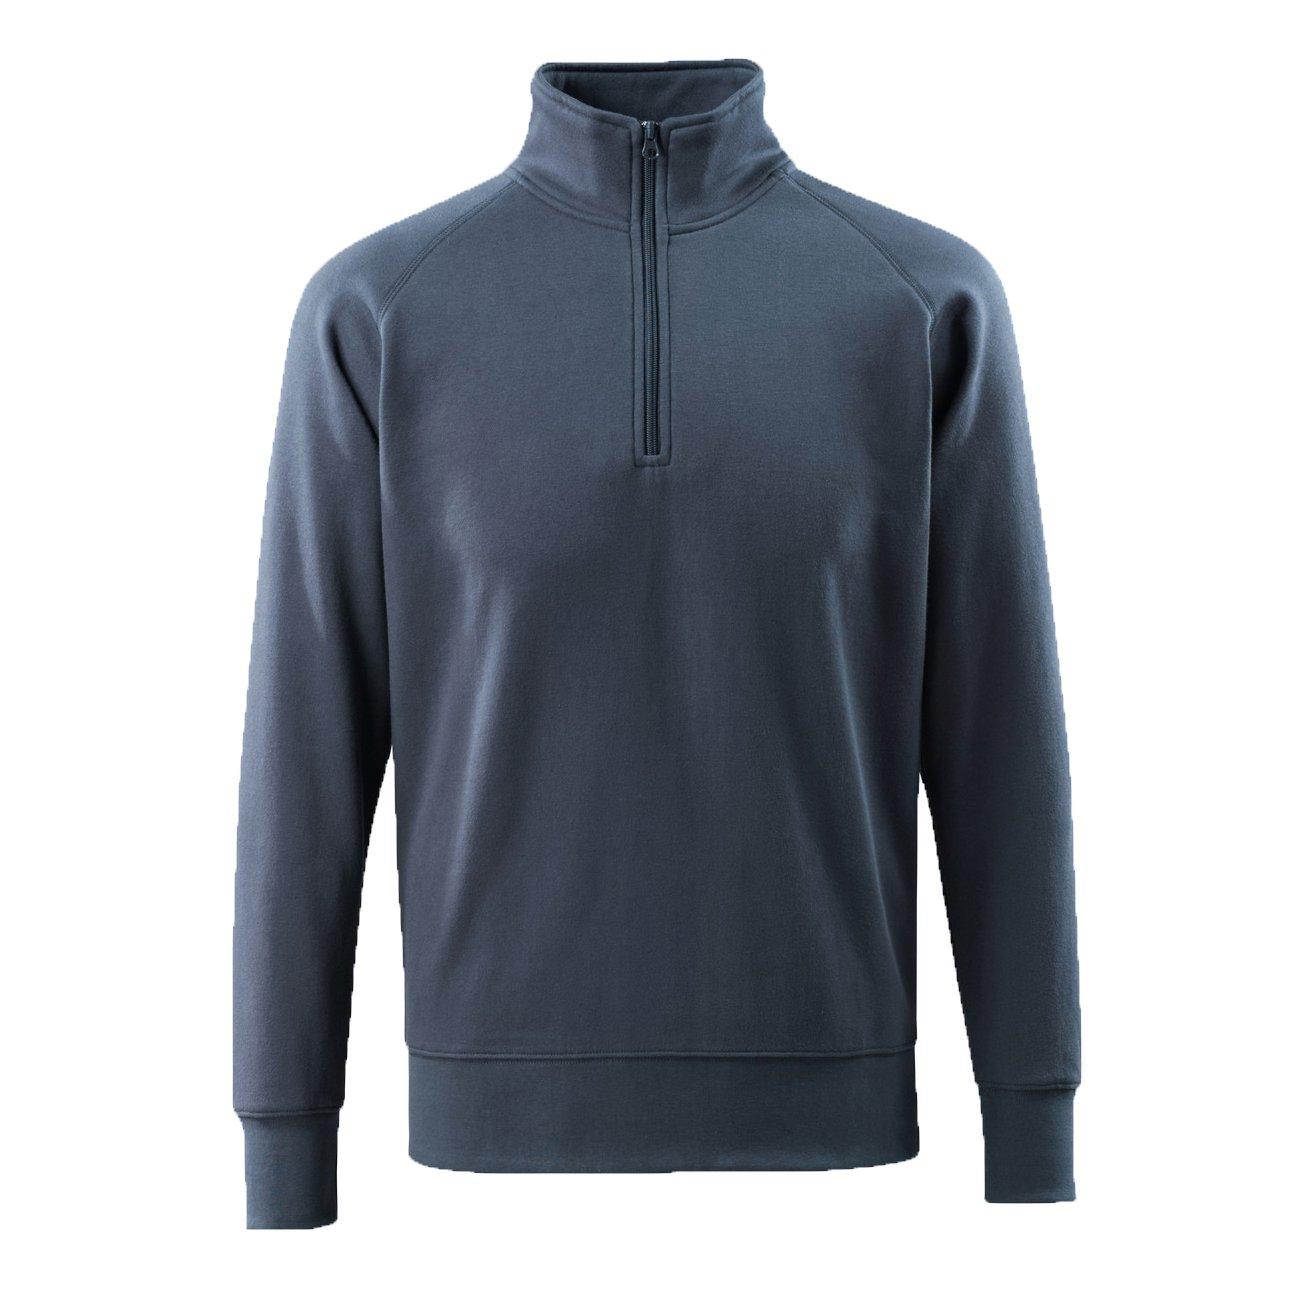 Mascot 50611-971-010-2XL SweatshirtNantes Size 2XL Black//Blue